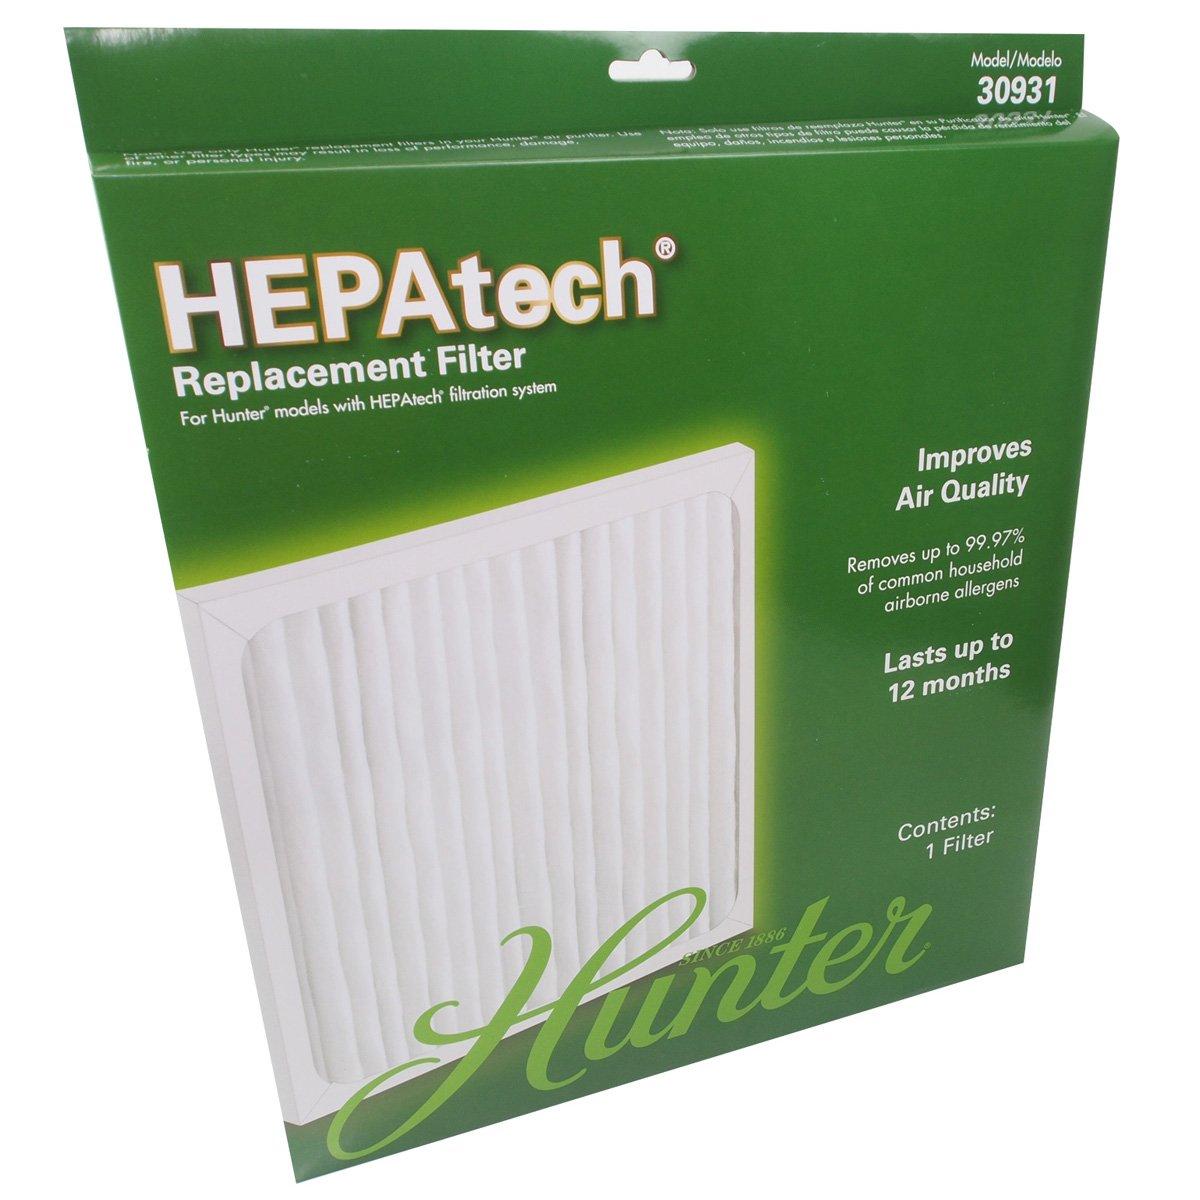 【激安大特価!】 HEPAtech B0002SP5H8 Replacement filter Model HEPAtech 30931 Model B0002SP5H8, 大野町:5d576f1b --- arianechie.dominiotemporario.com